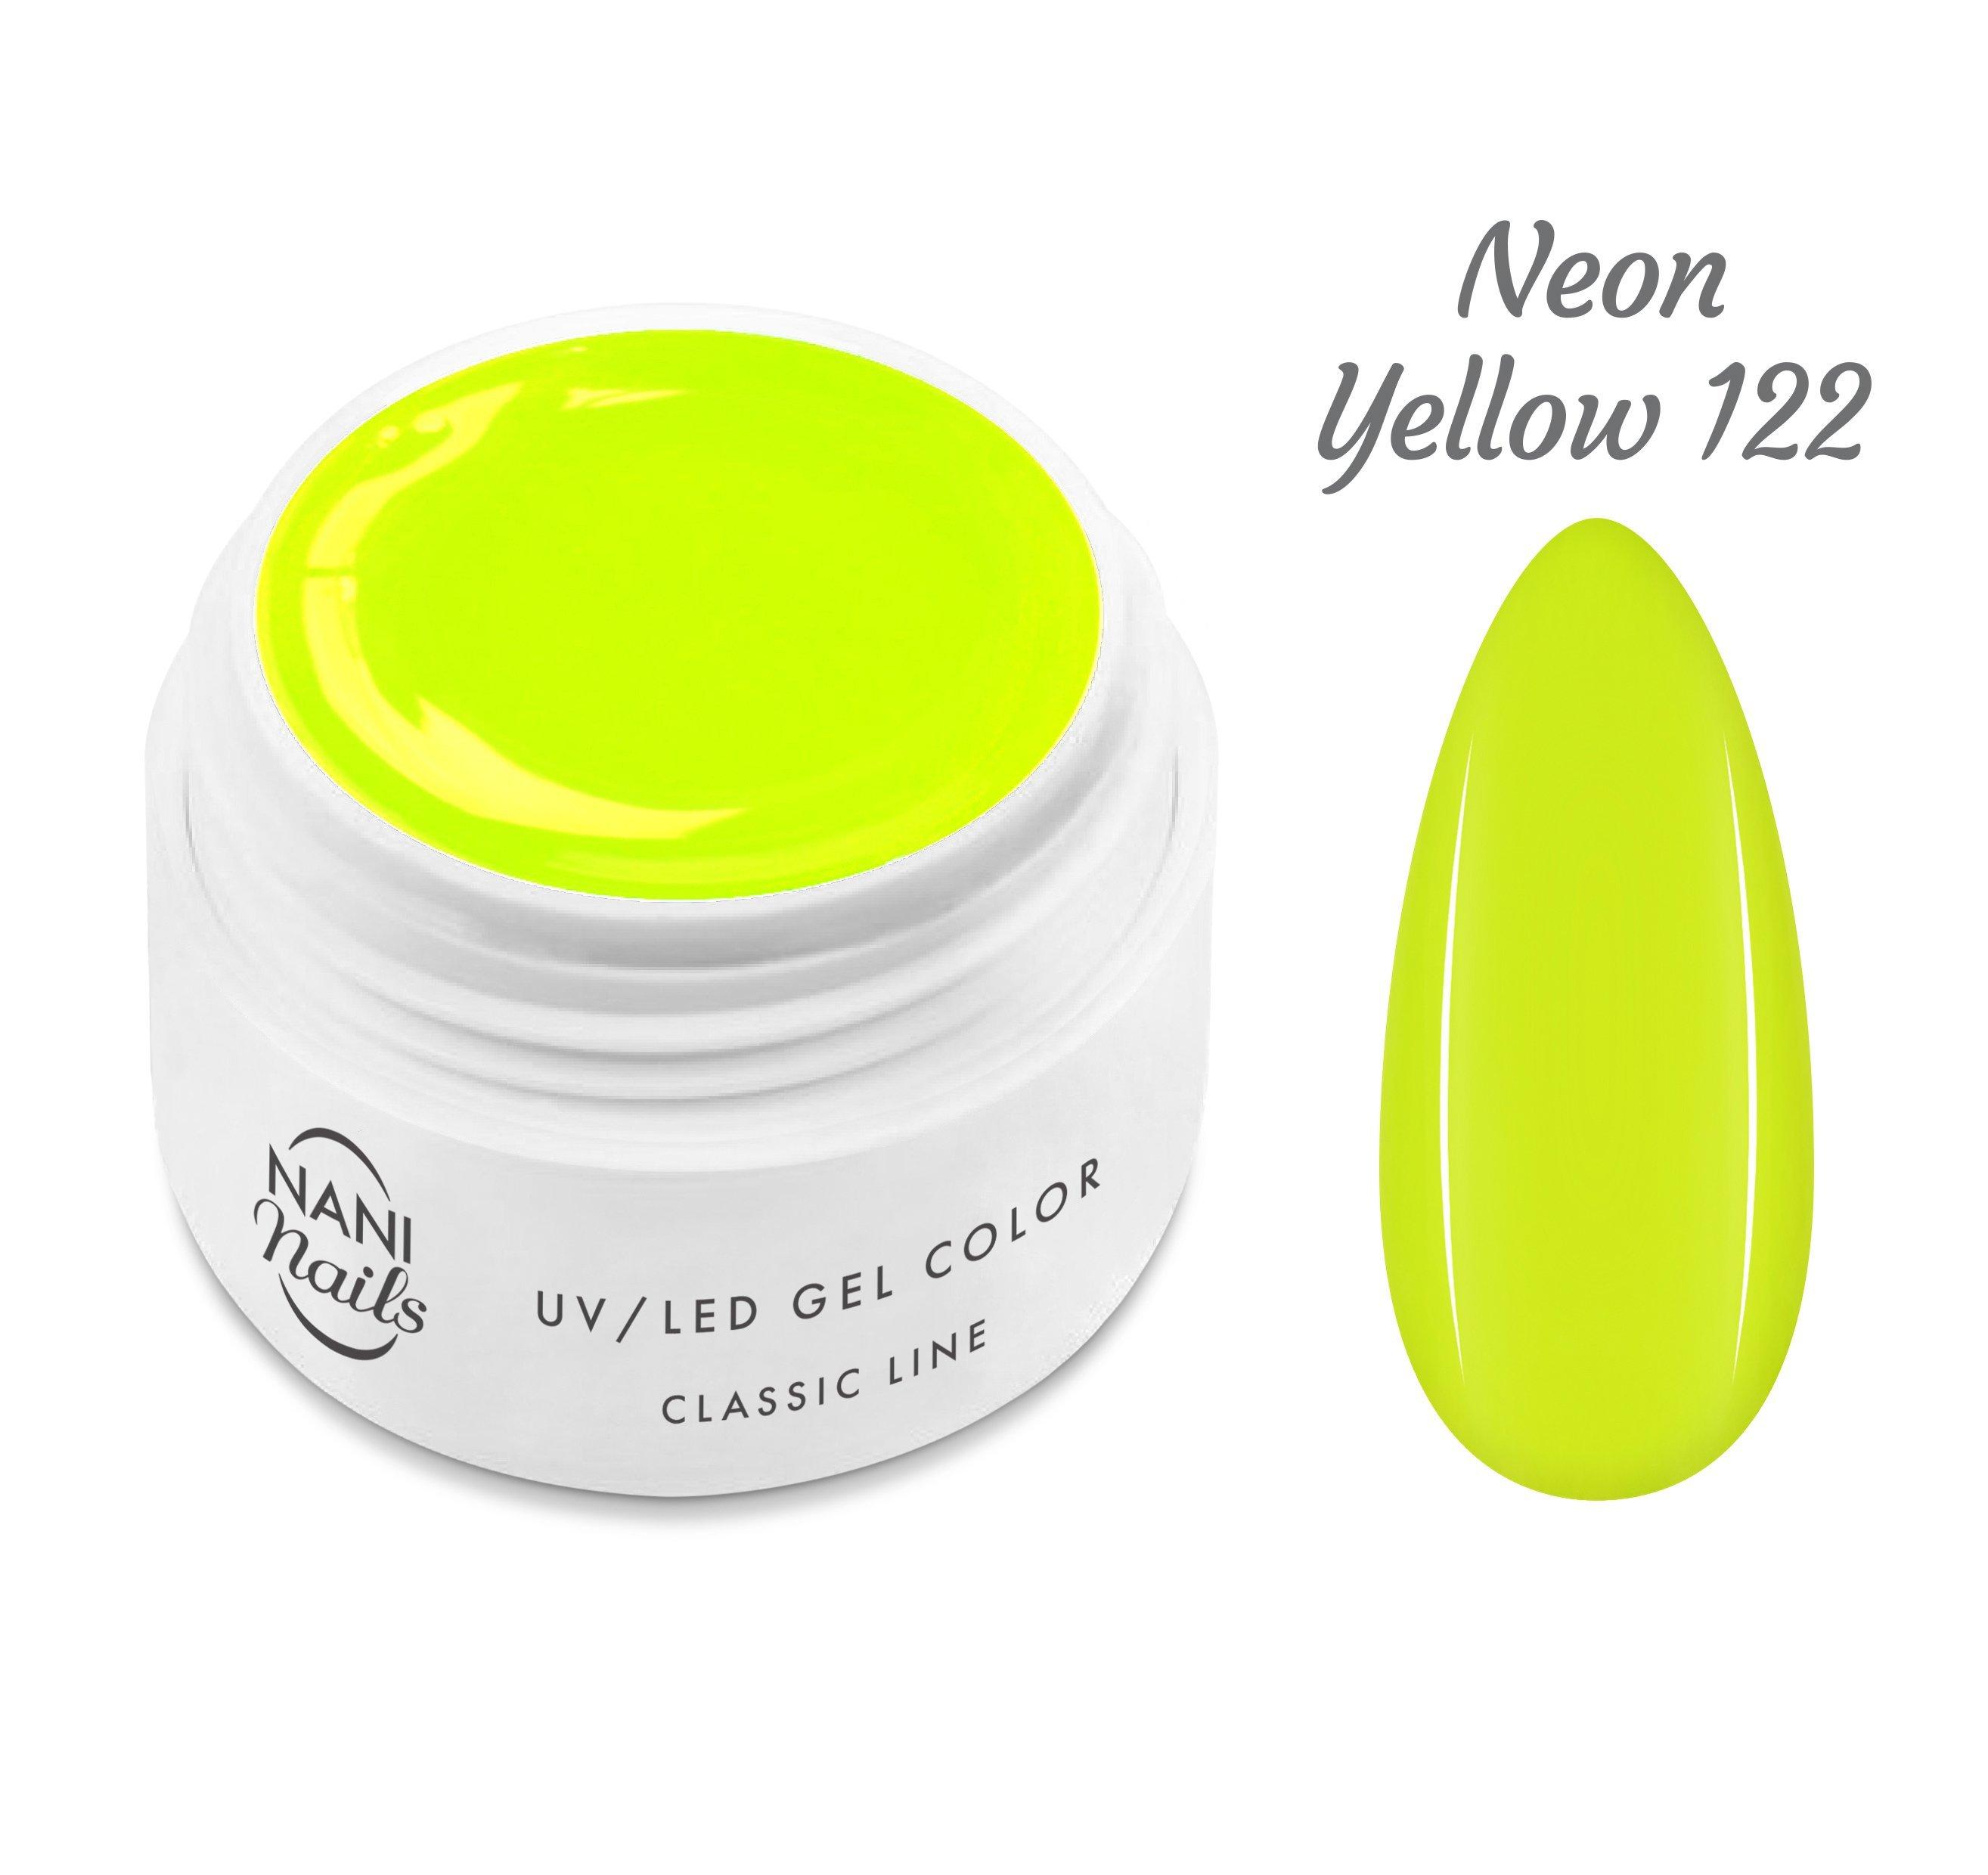 NANI UV gél Classic Line 5 ml - Neon Yellow